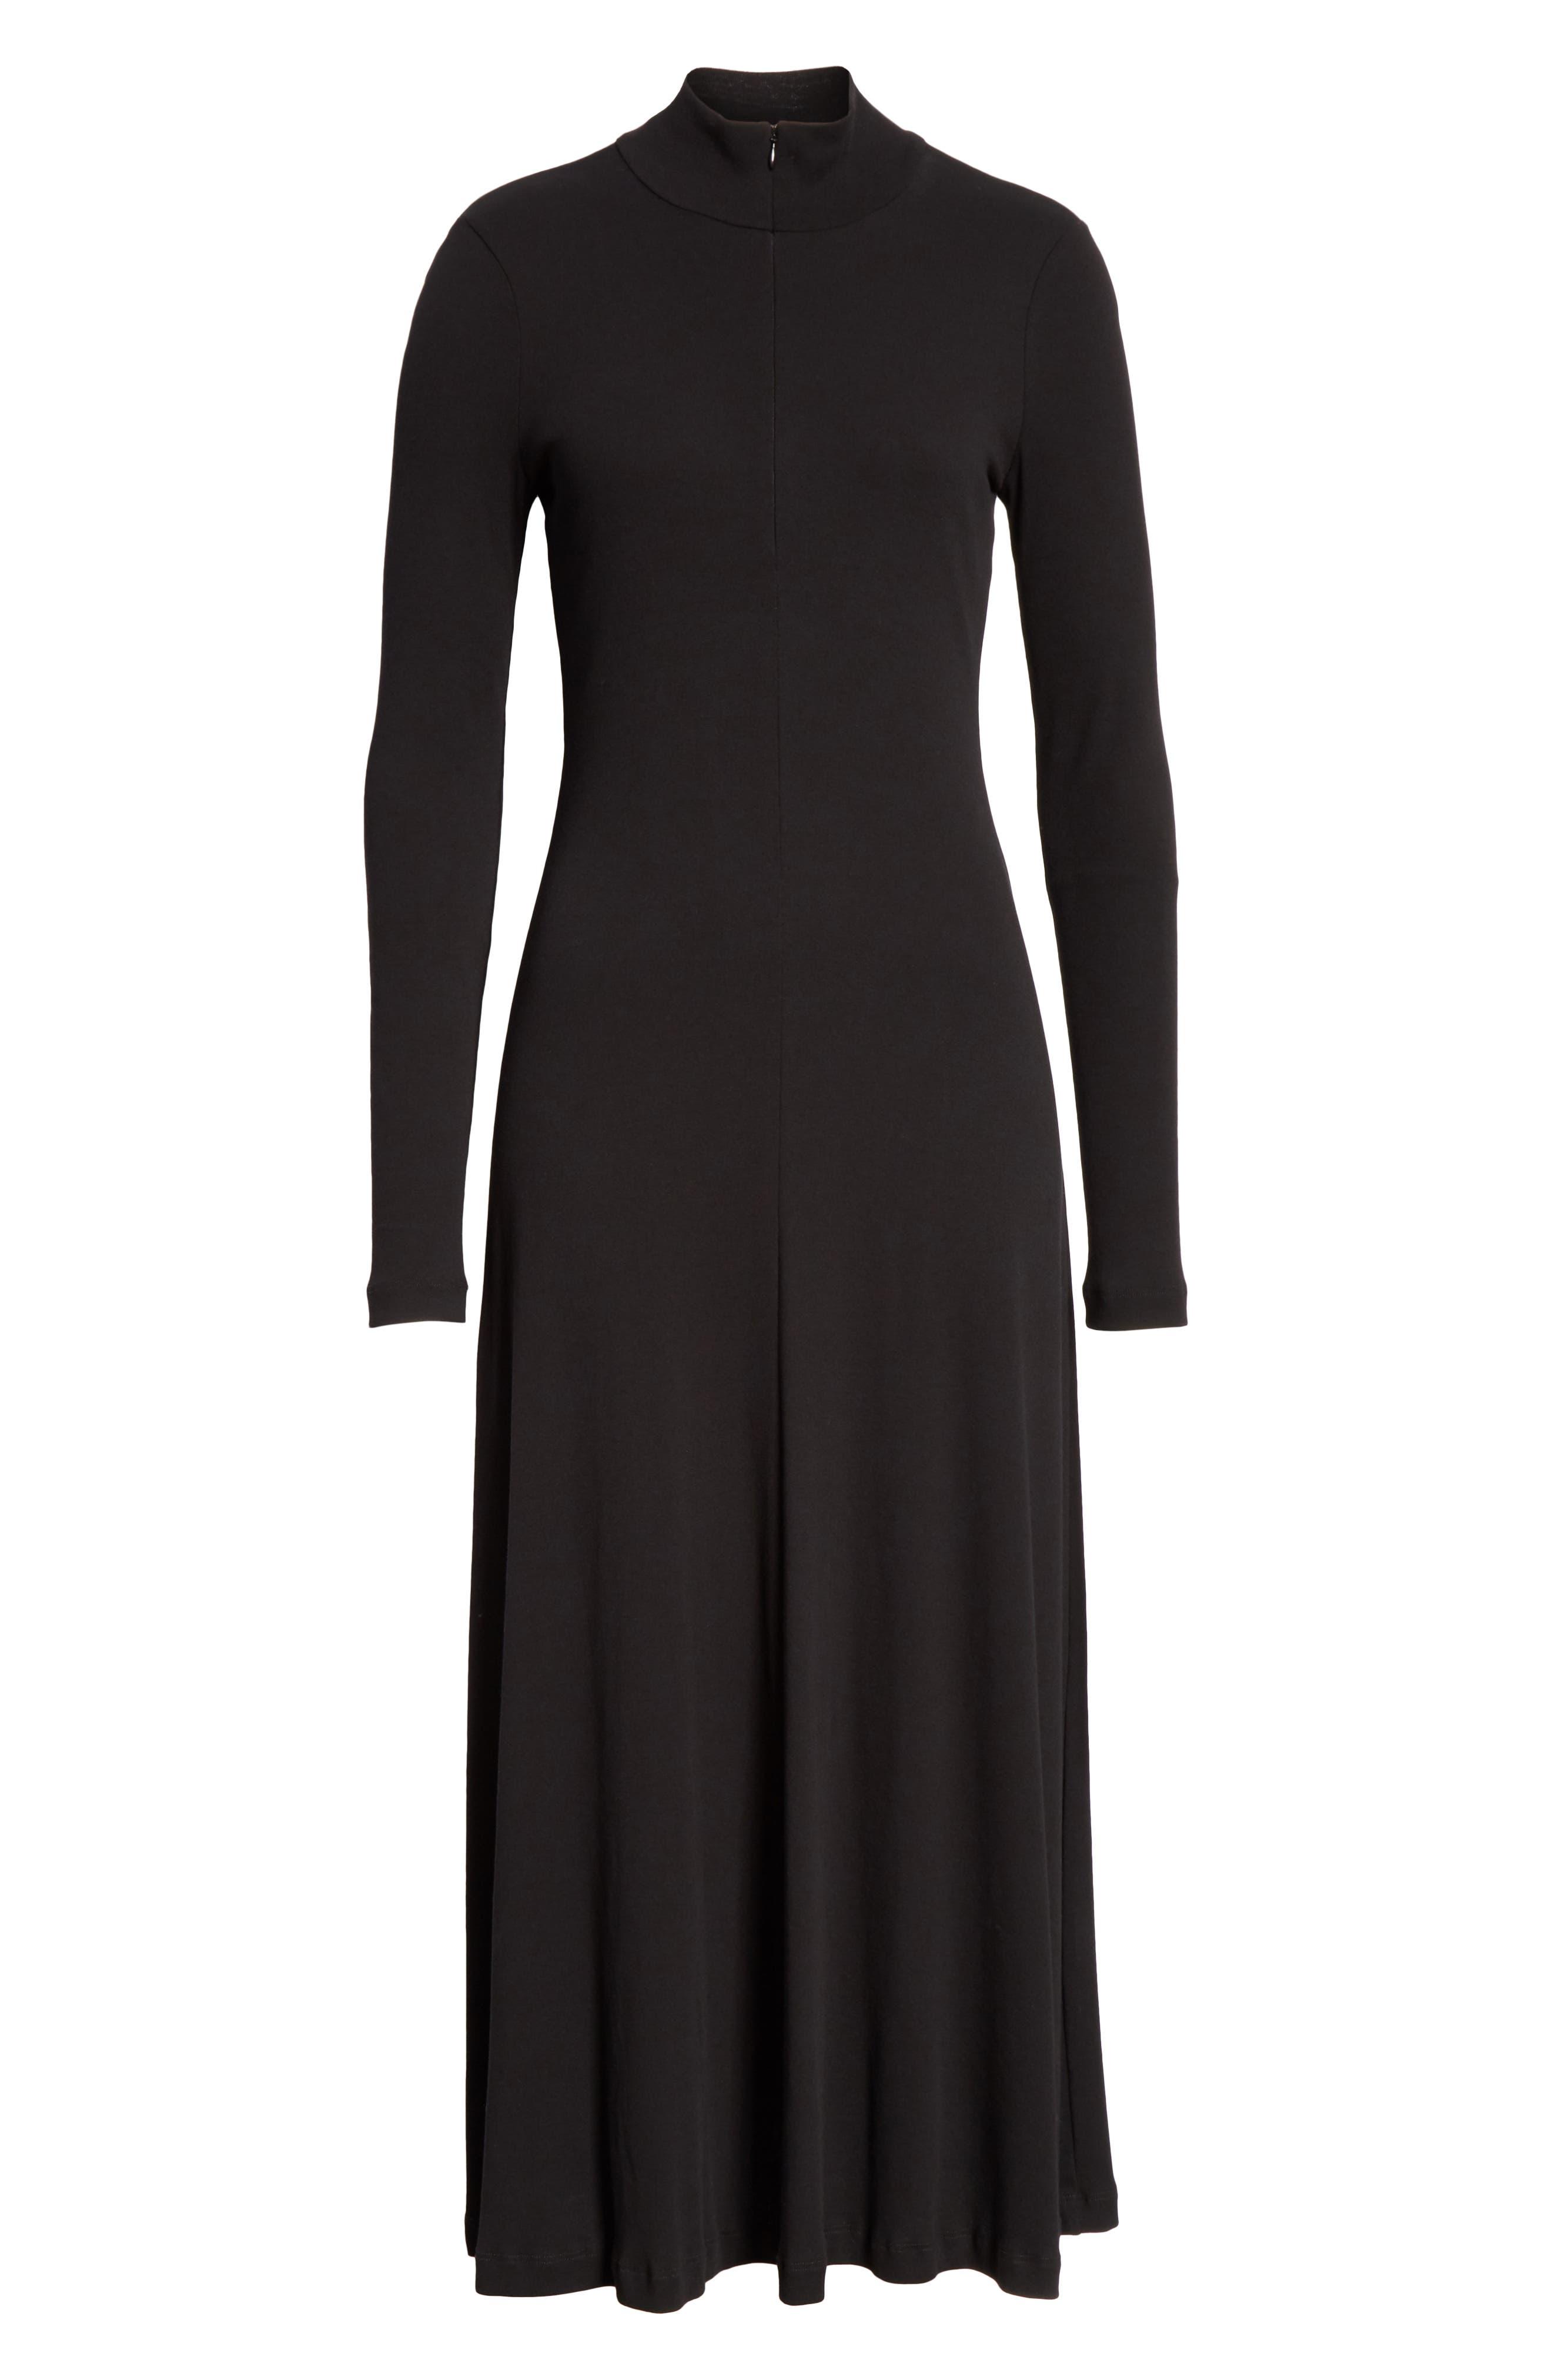 ROSETTA GETTY, Turtleneck Jersey Dress, Alternate thumbnail 6, color, BLACK